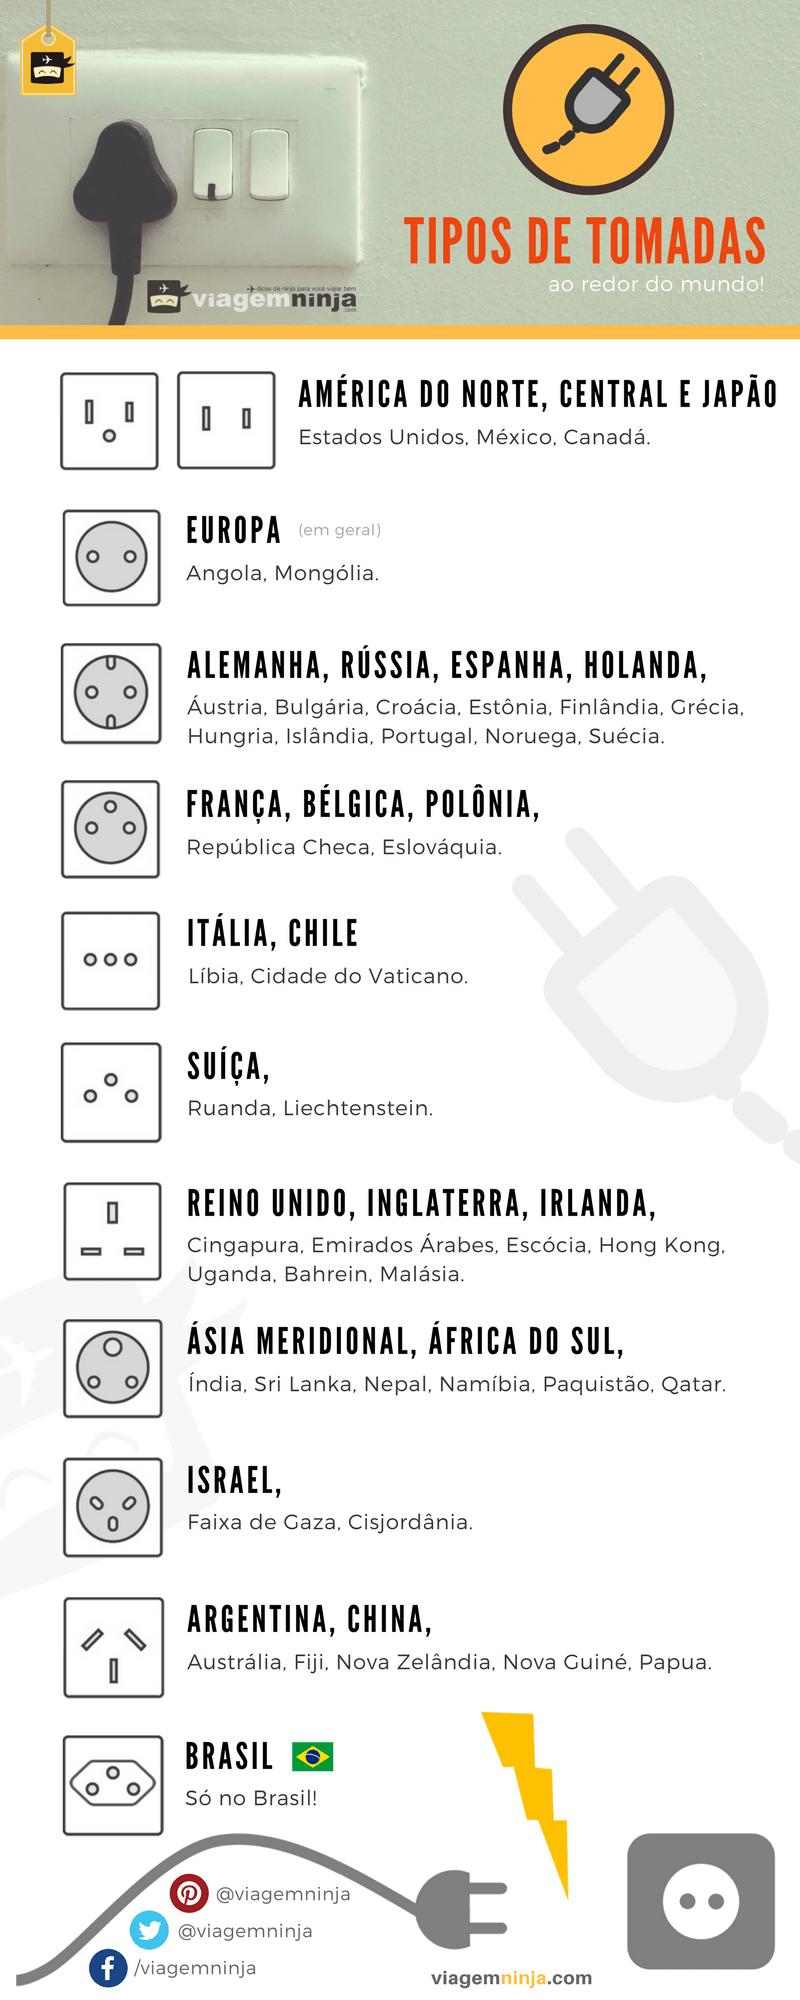 tipos-de-tomadas-e-plugs-de-varios-paises-infografico